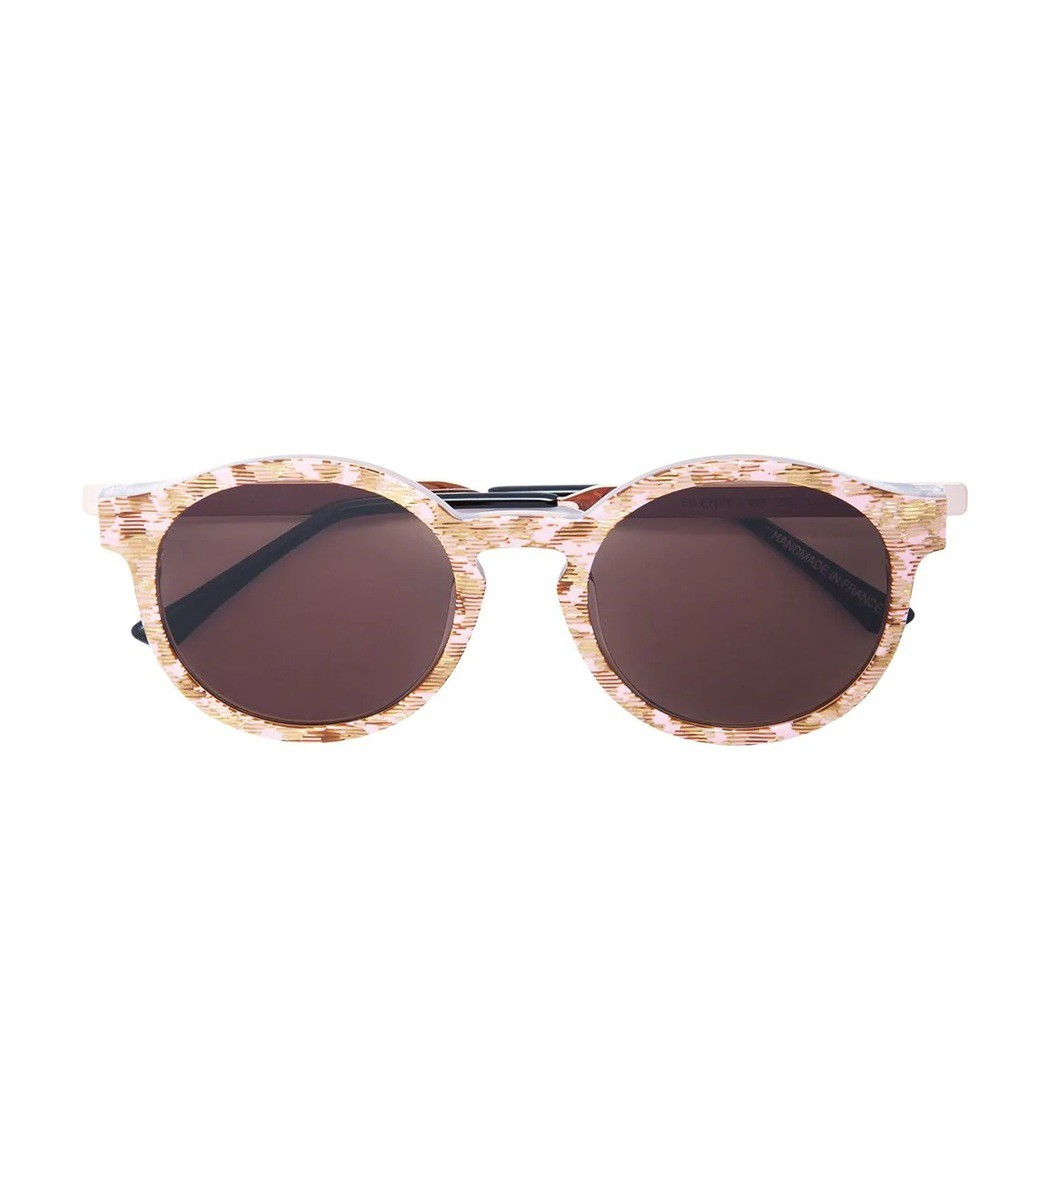 Thierry Lasry Silenty Round Sunglasses